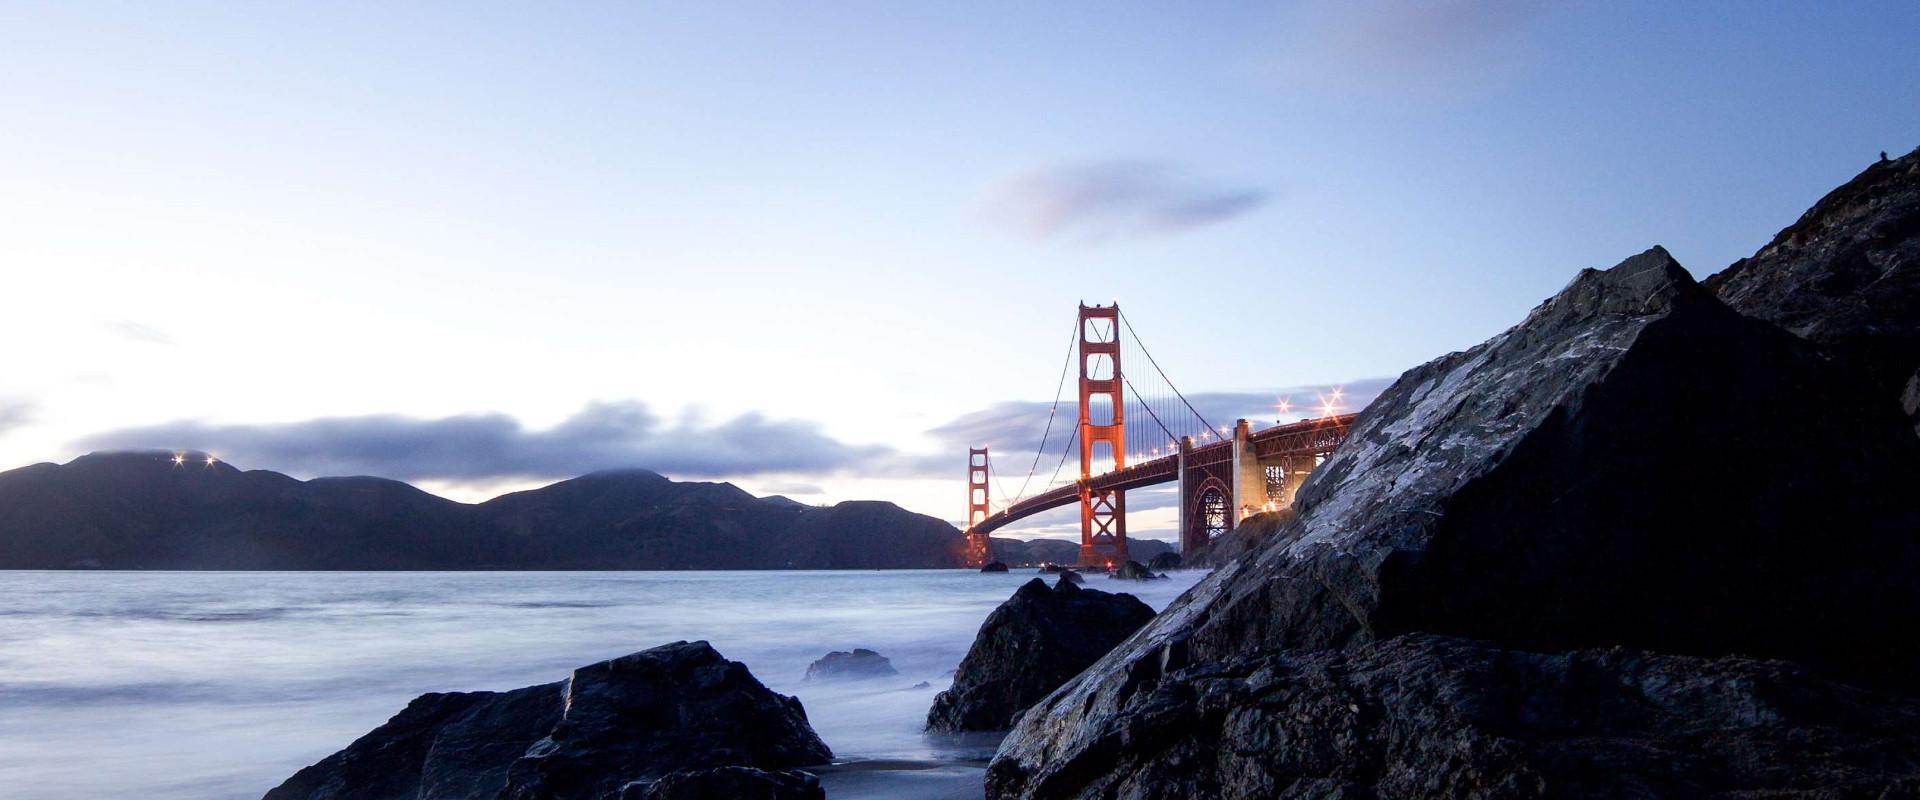 From the Golden Gate Bridge ...